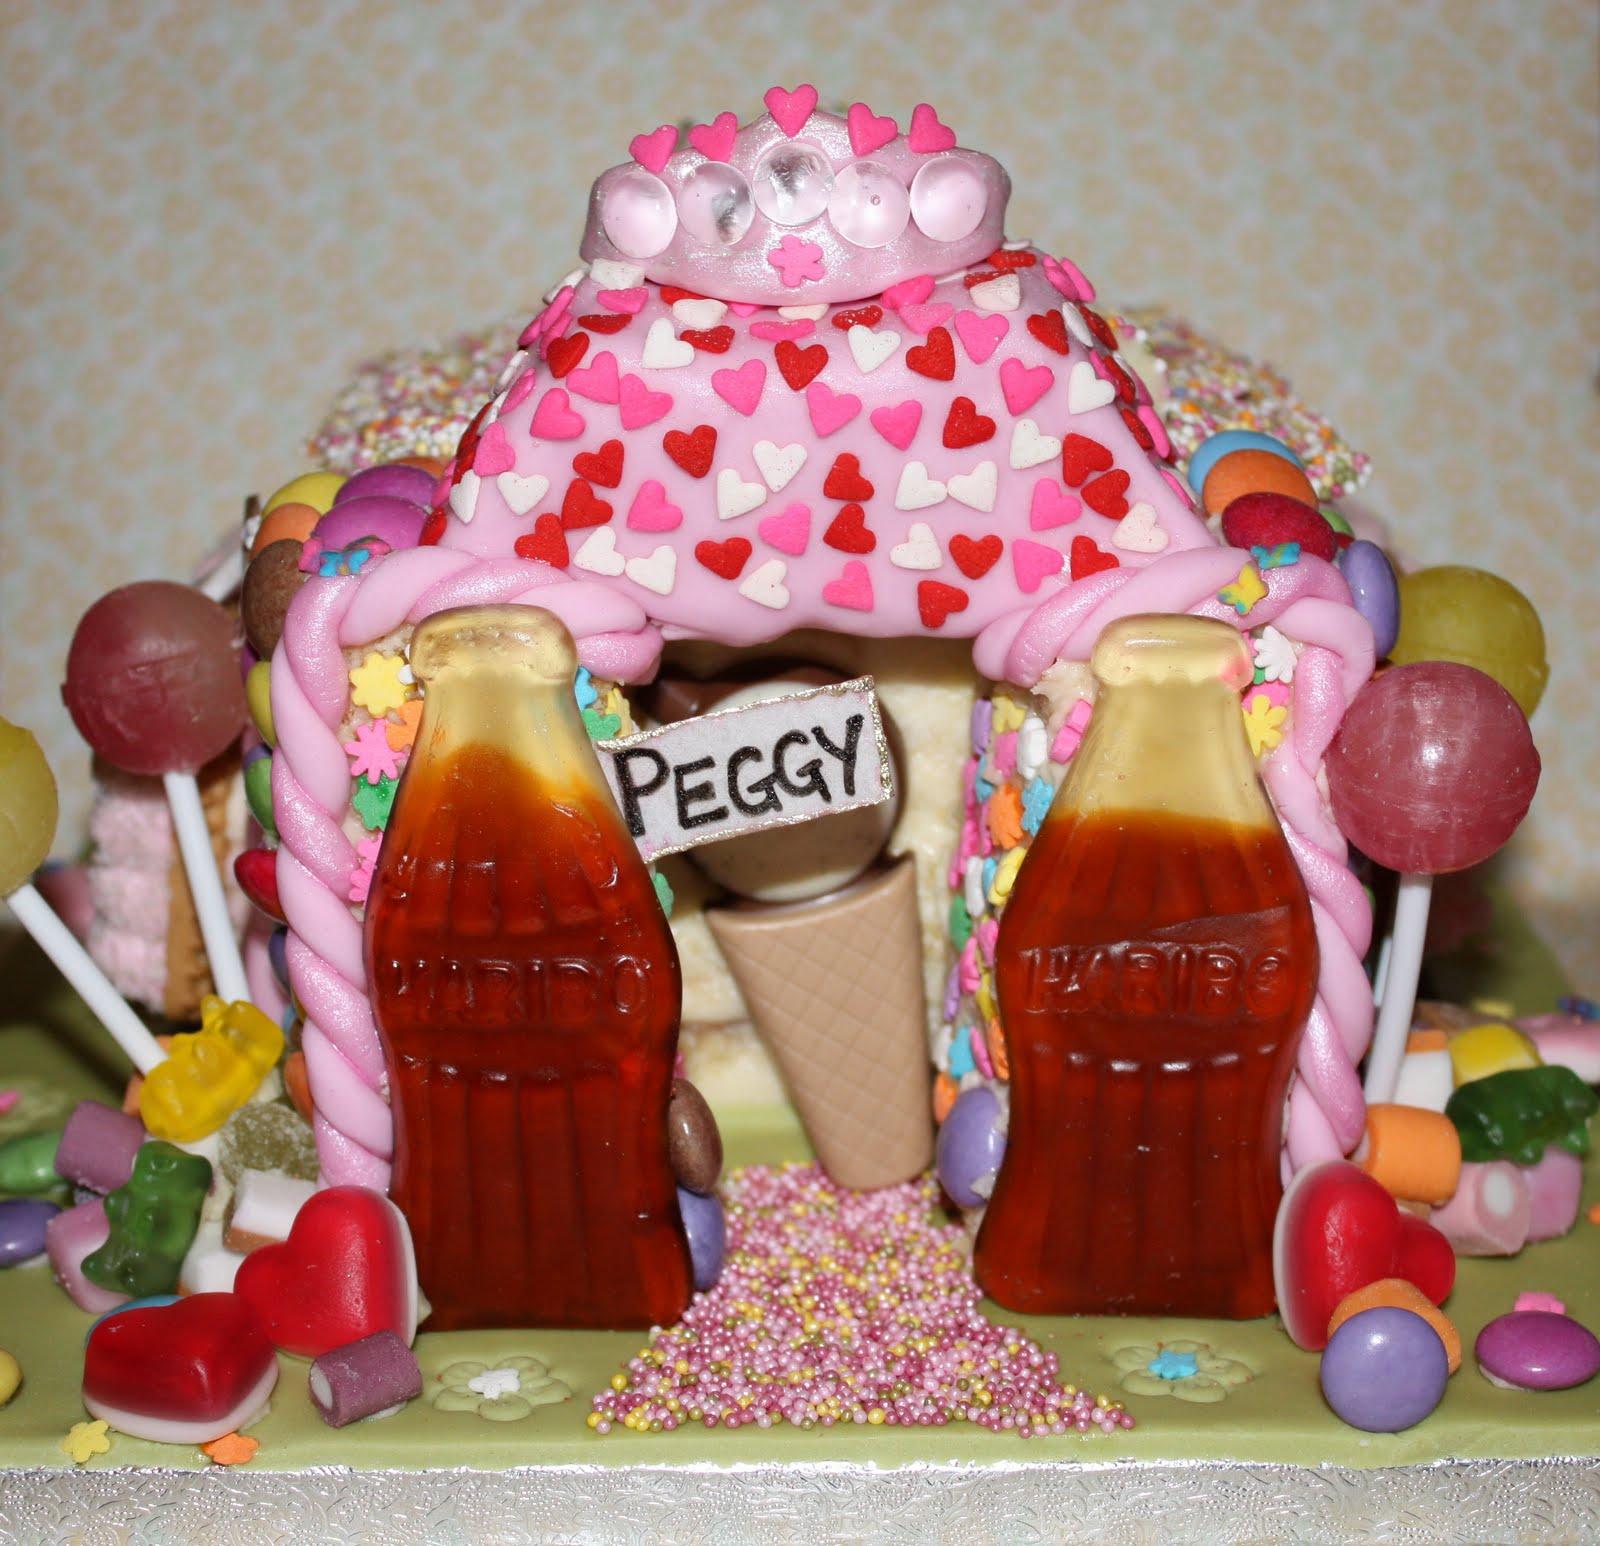 BAKER LU CAKES: Sweetie House & Cupcakes